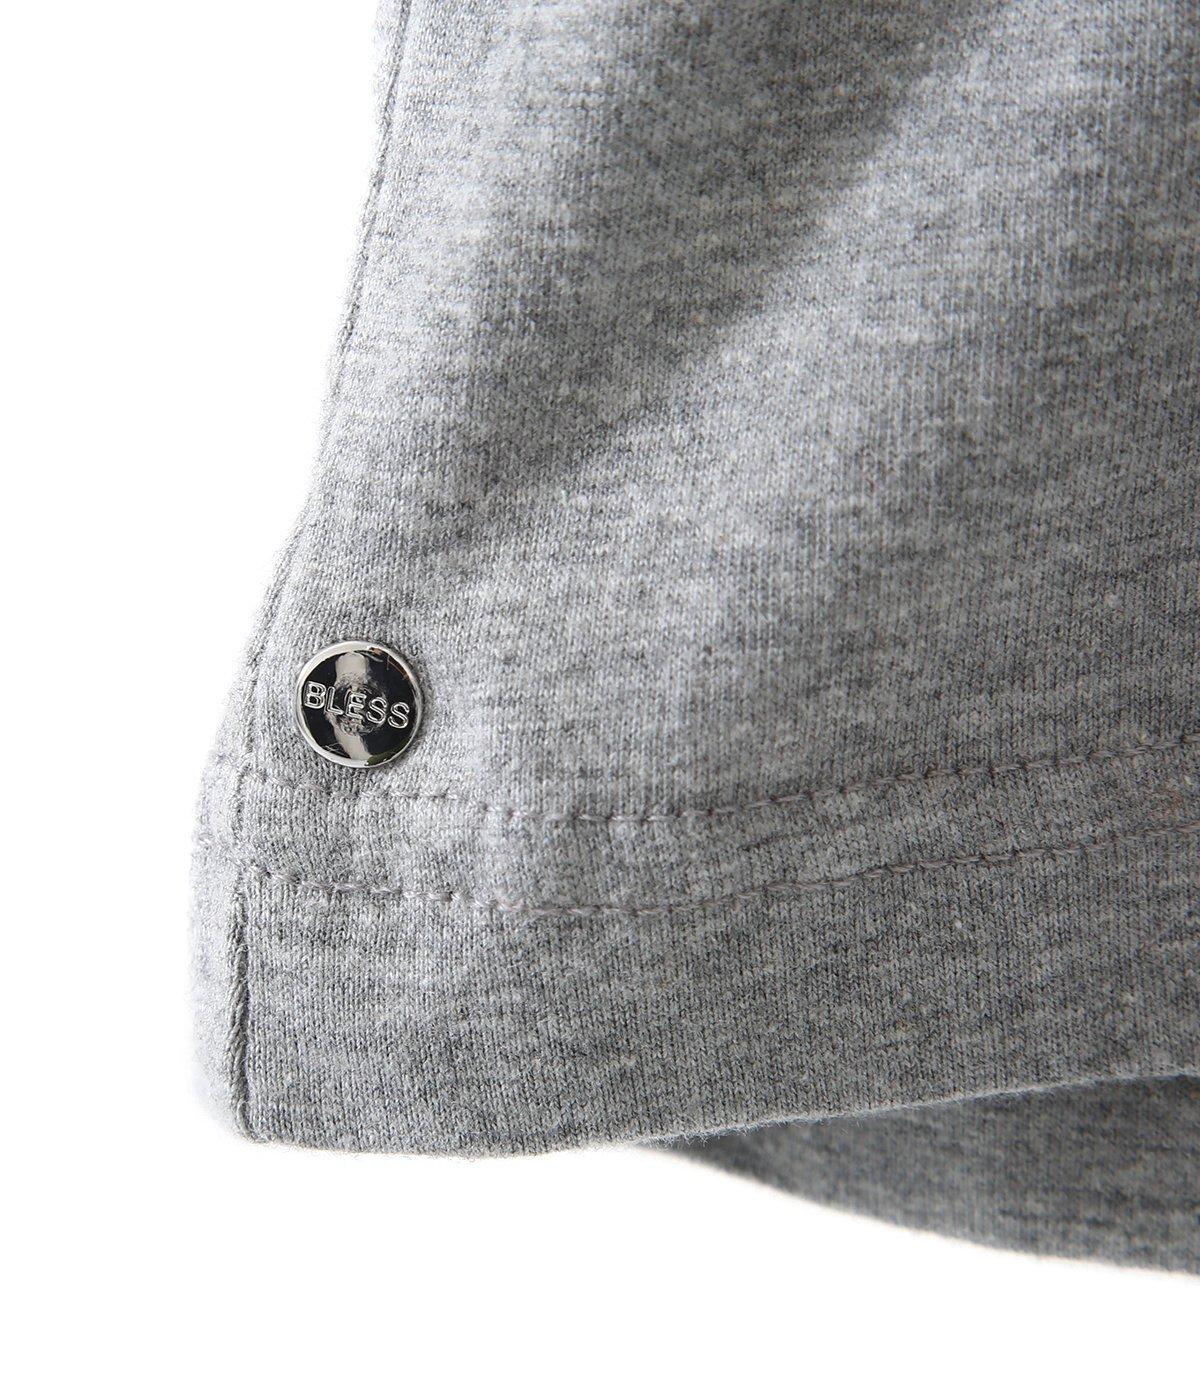 Stitched Starcut Ⅱ